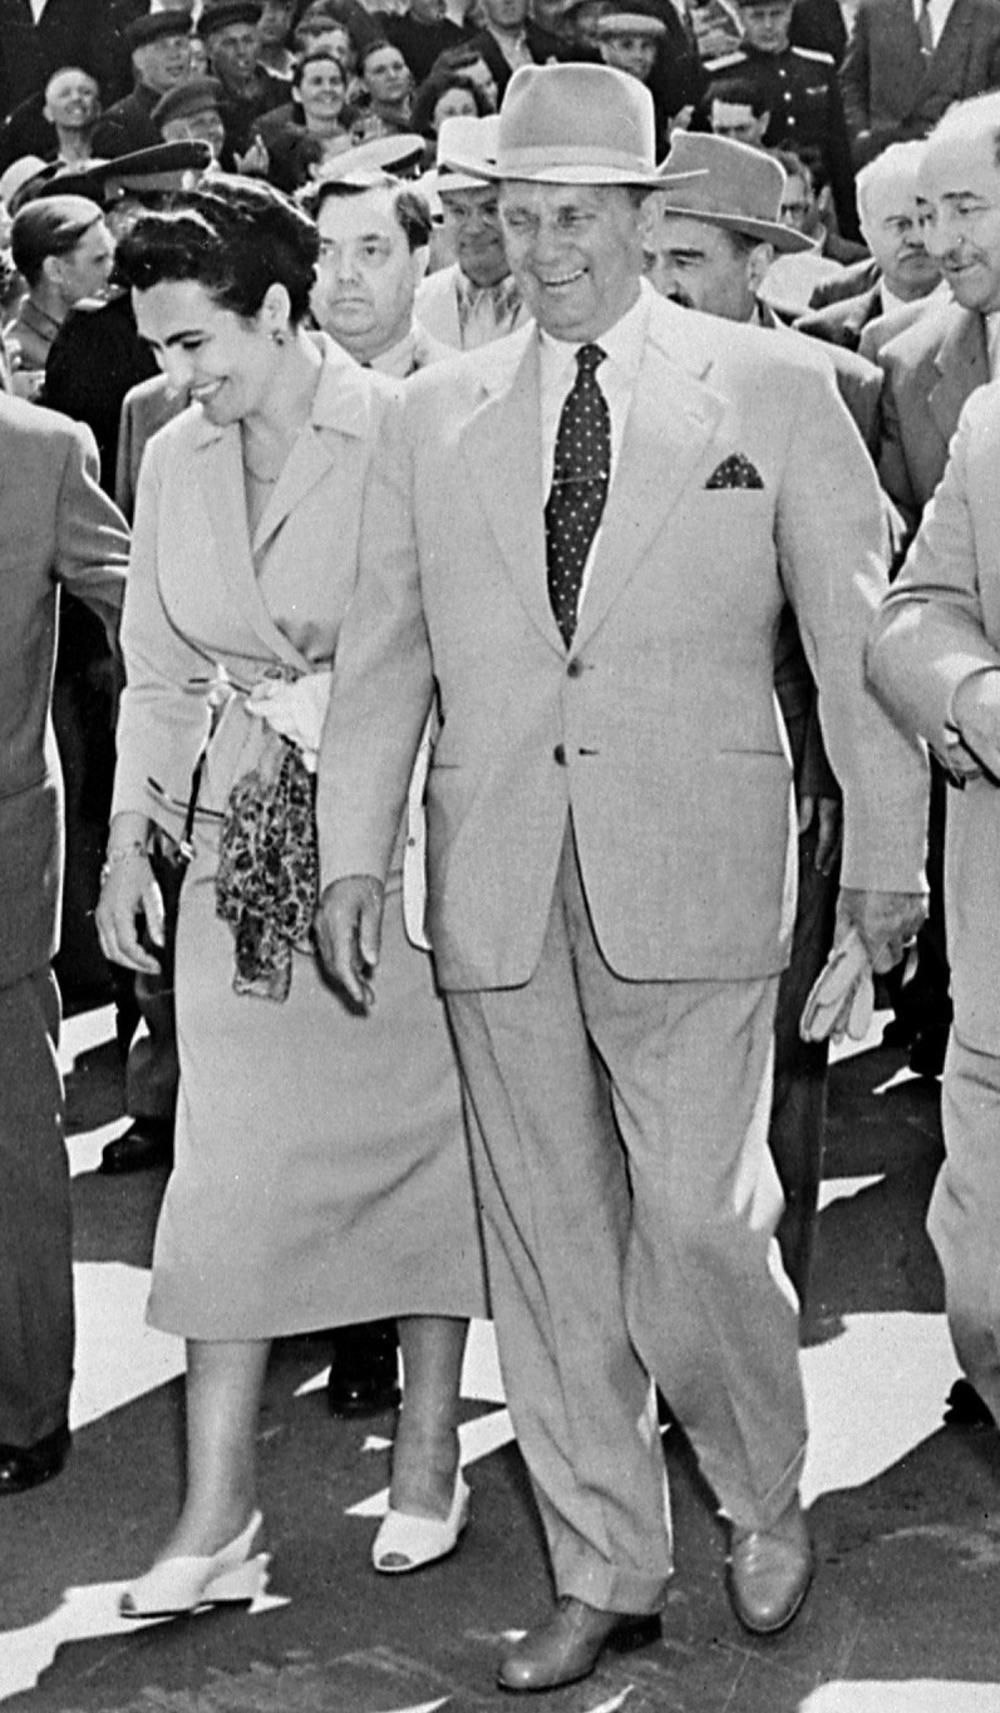 Jovanka Broz, Tito, Josip Broz Tito